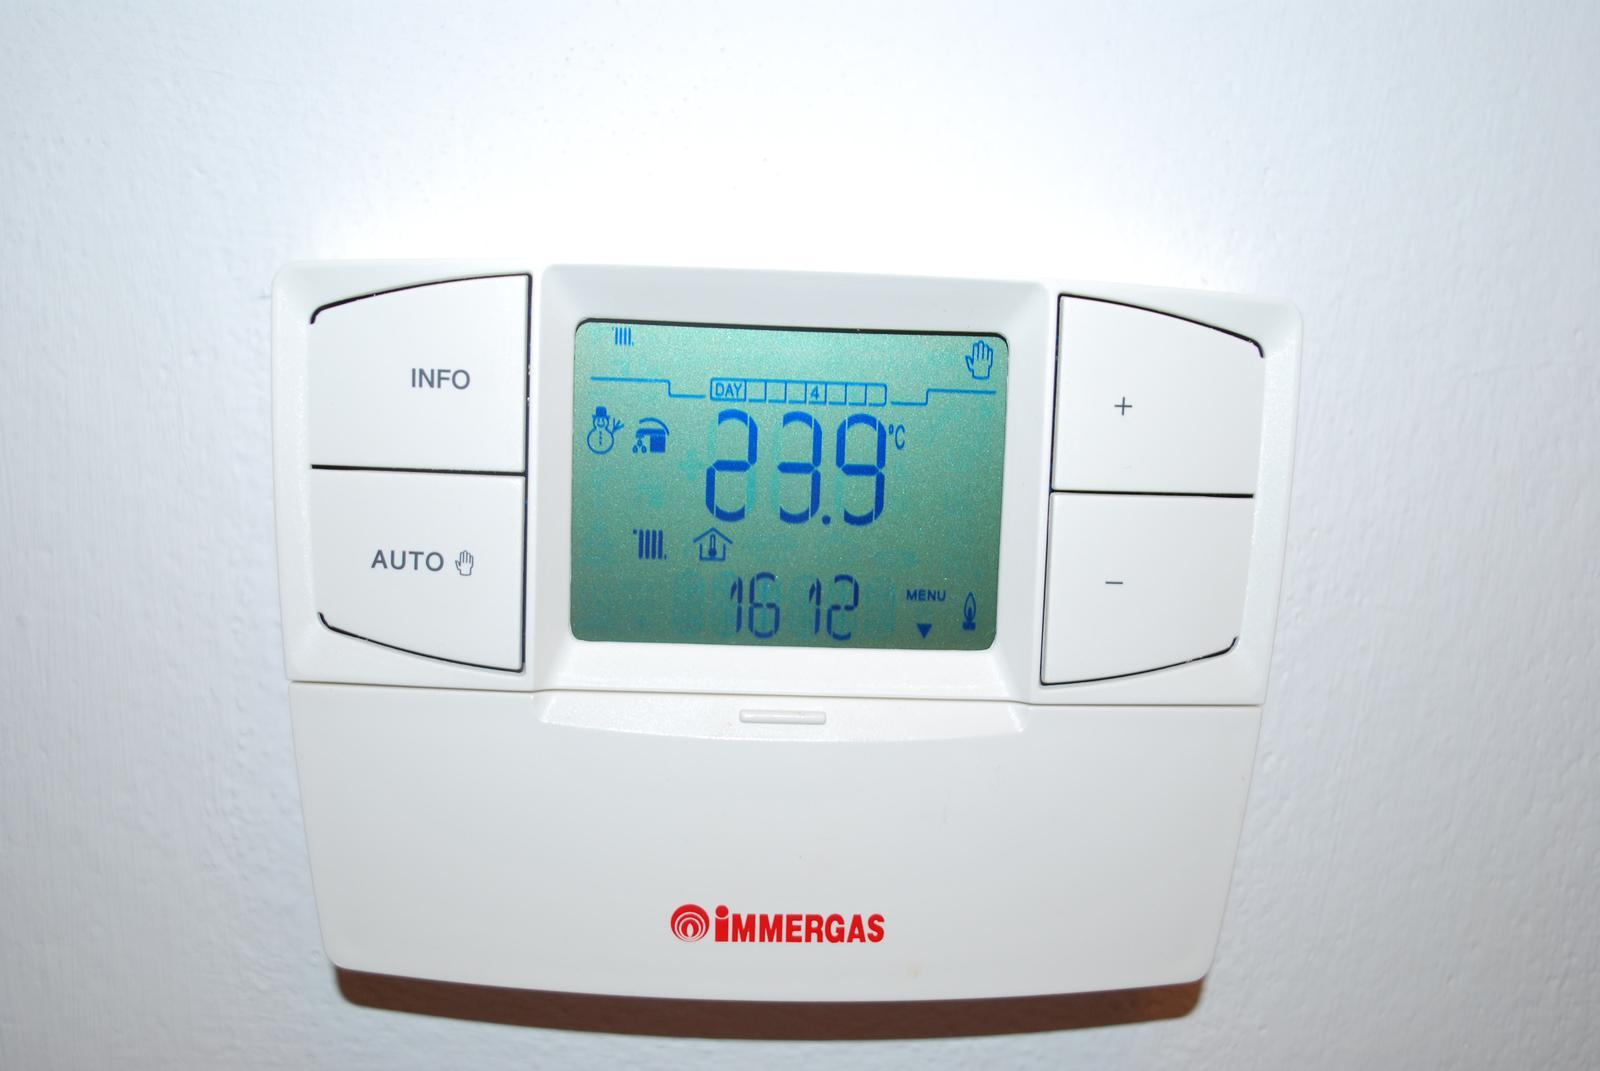 Kotol mi nevypina pri znizeni teploty cez termosta... - str. 2